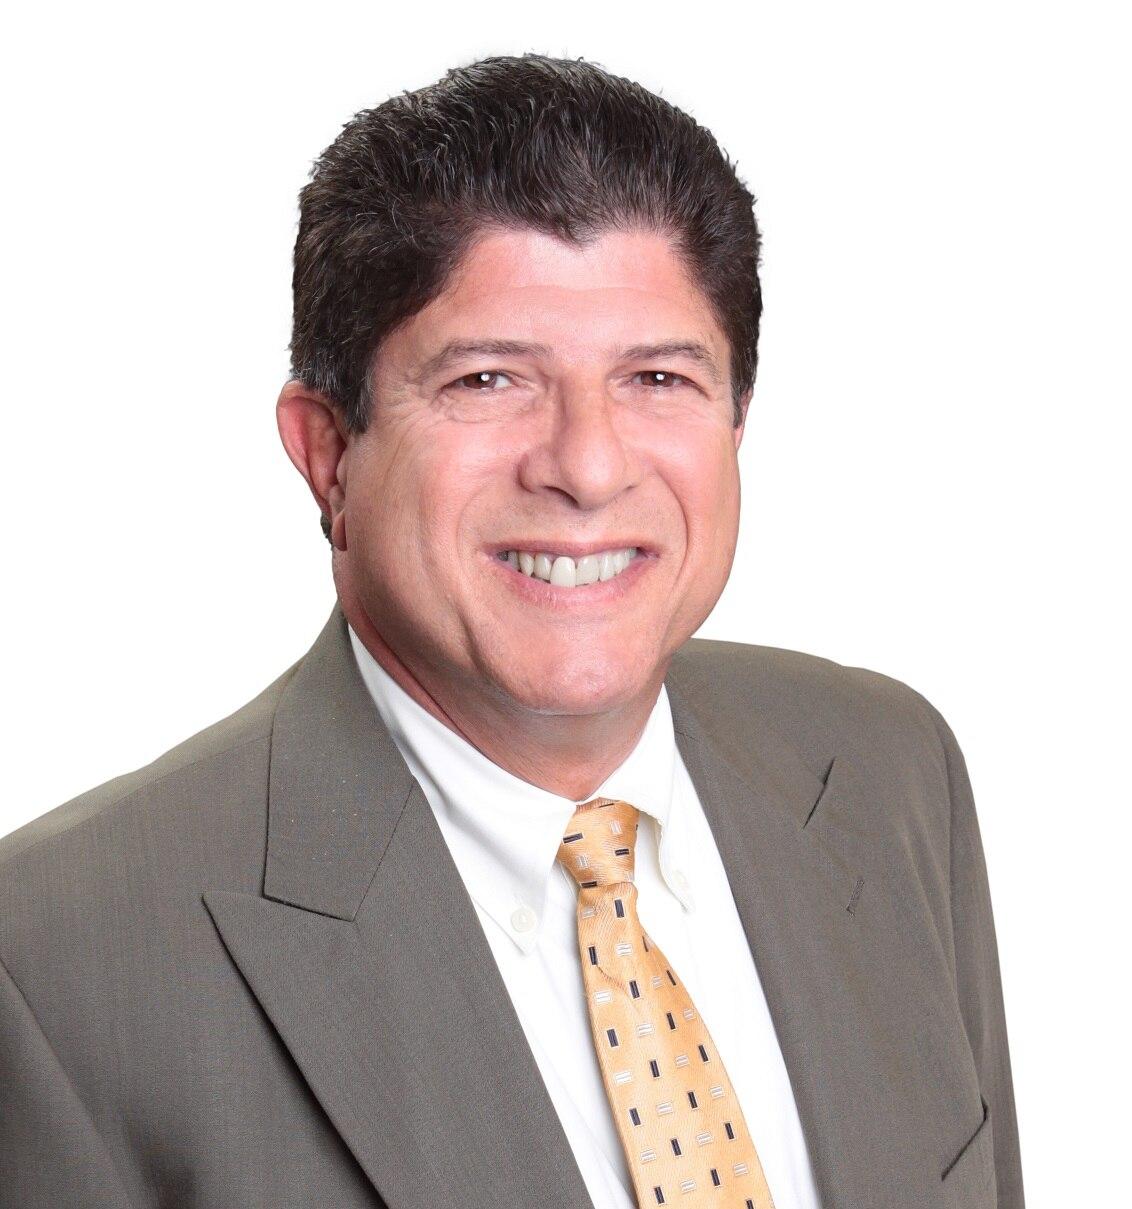 ENRIQUE RAFAEL CORTINAS  Your Financial Professional & Insurance Agent